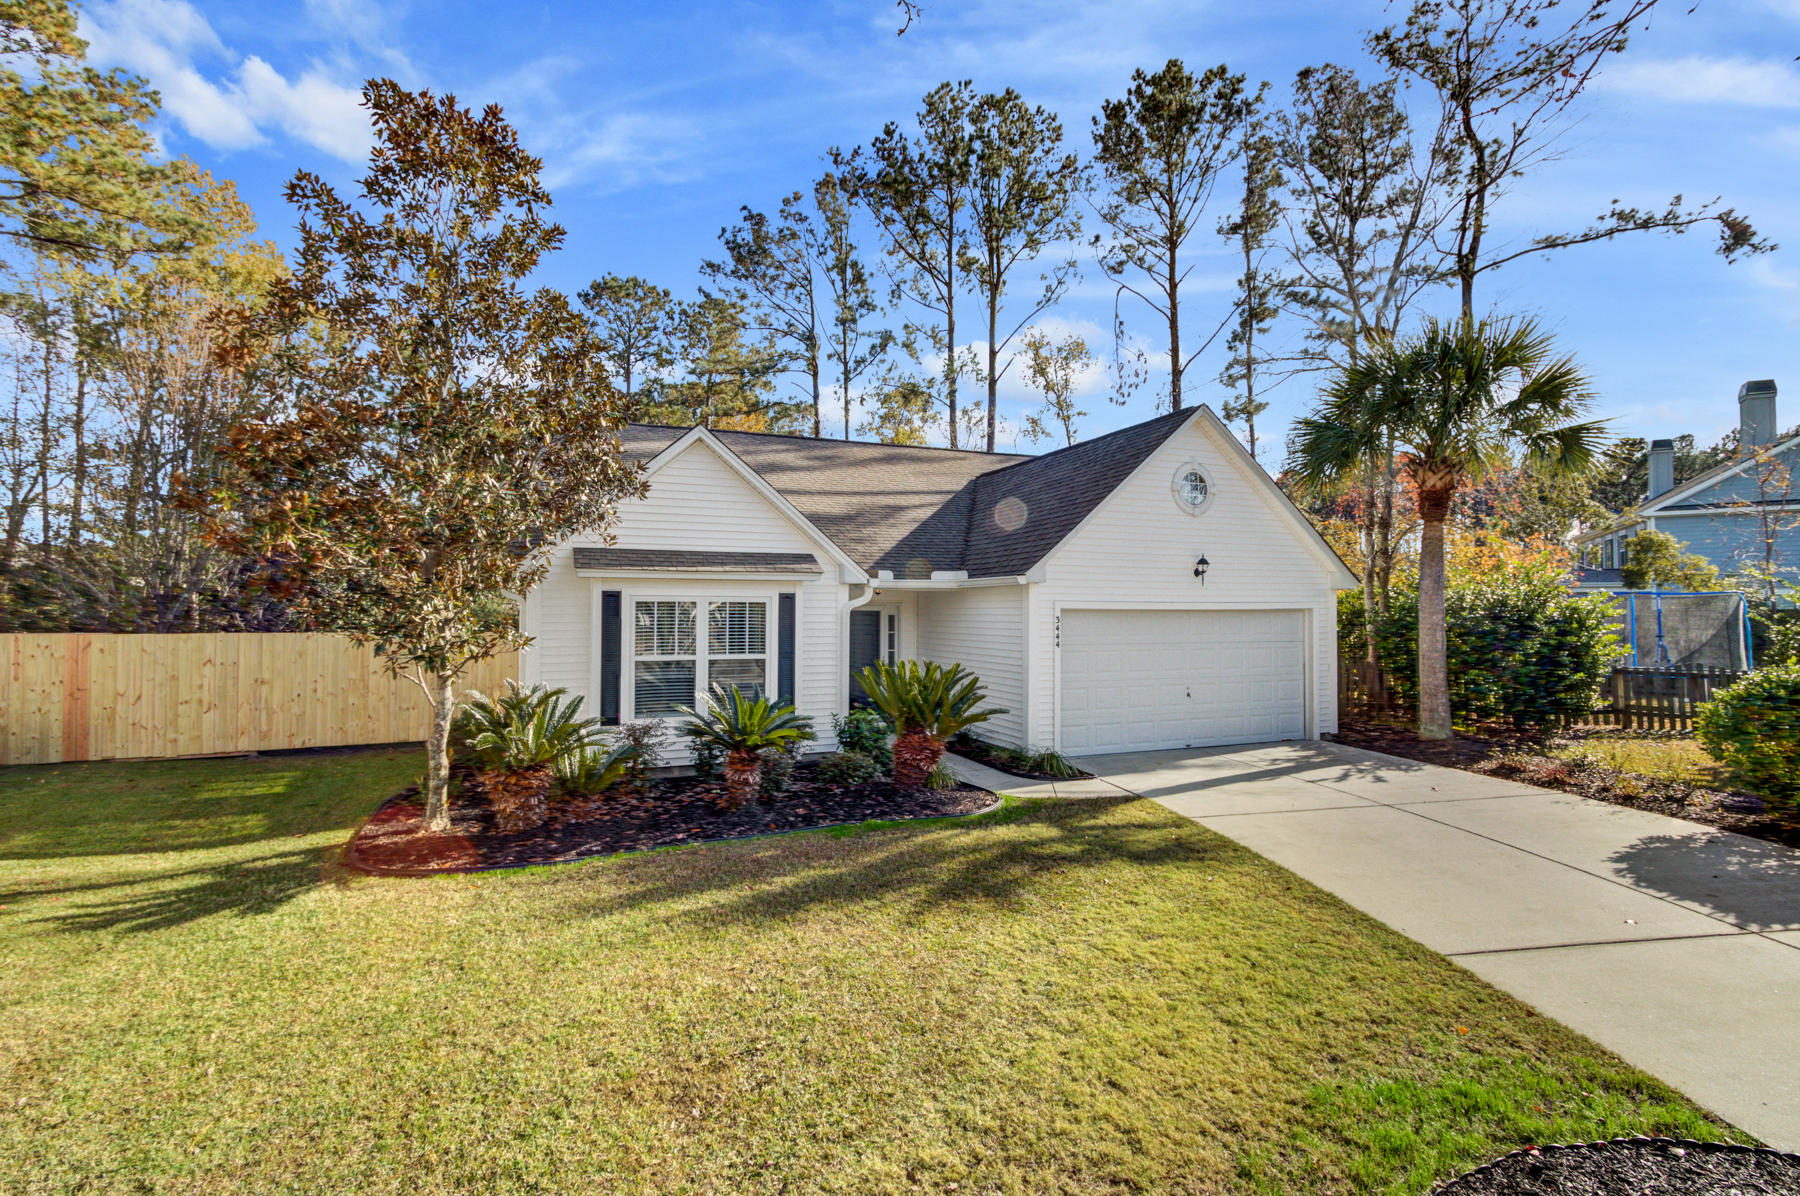 Park West Homes For Sale - 3444 Wellesley, Mount Pleasant, SC - 26